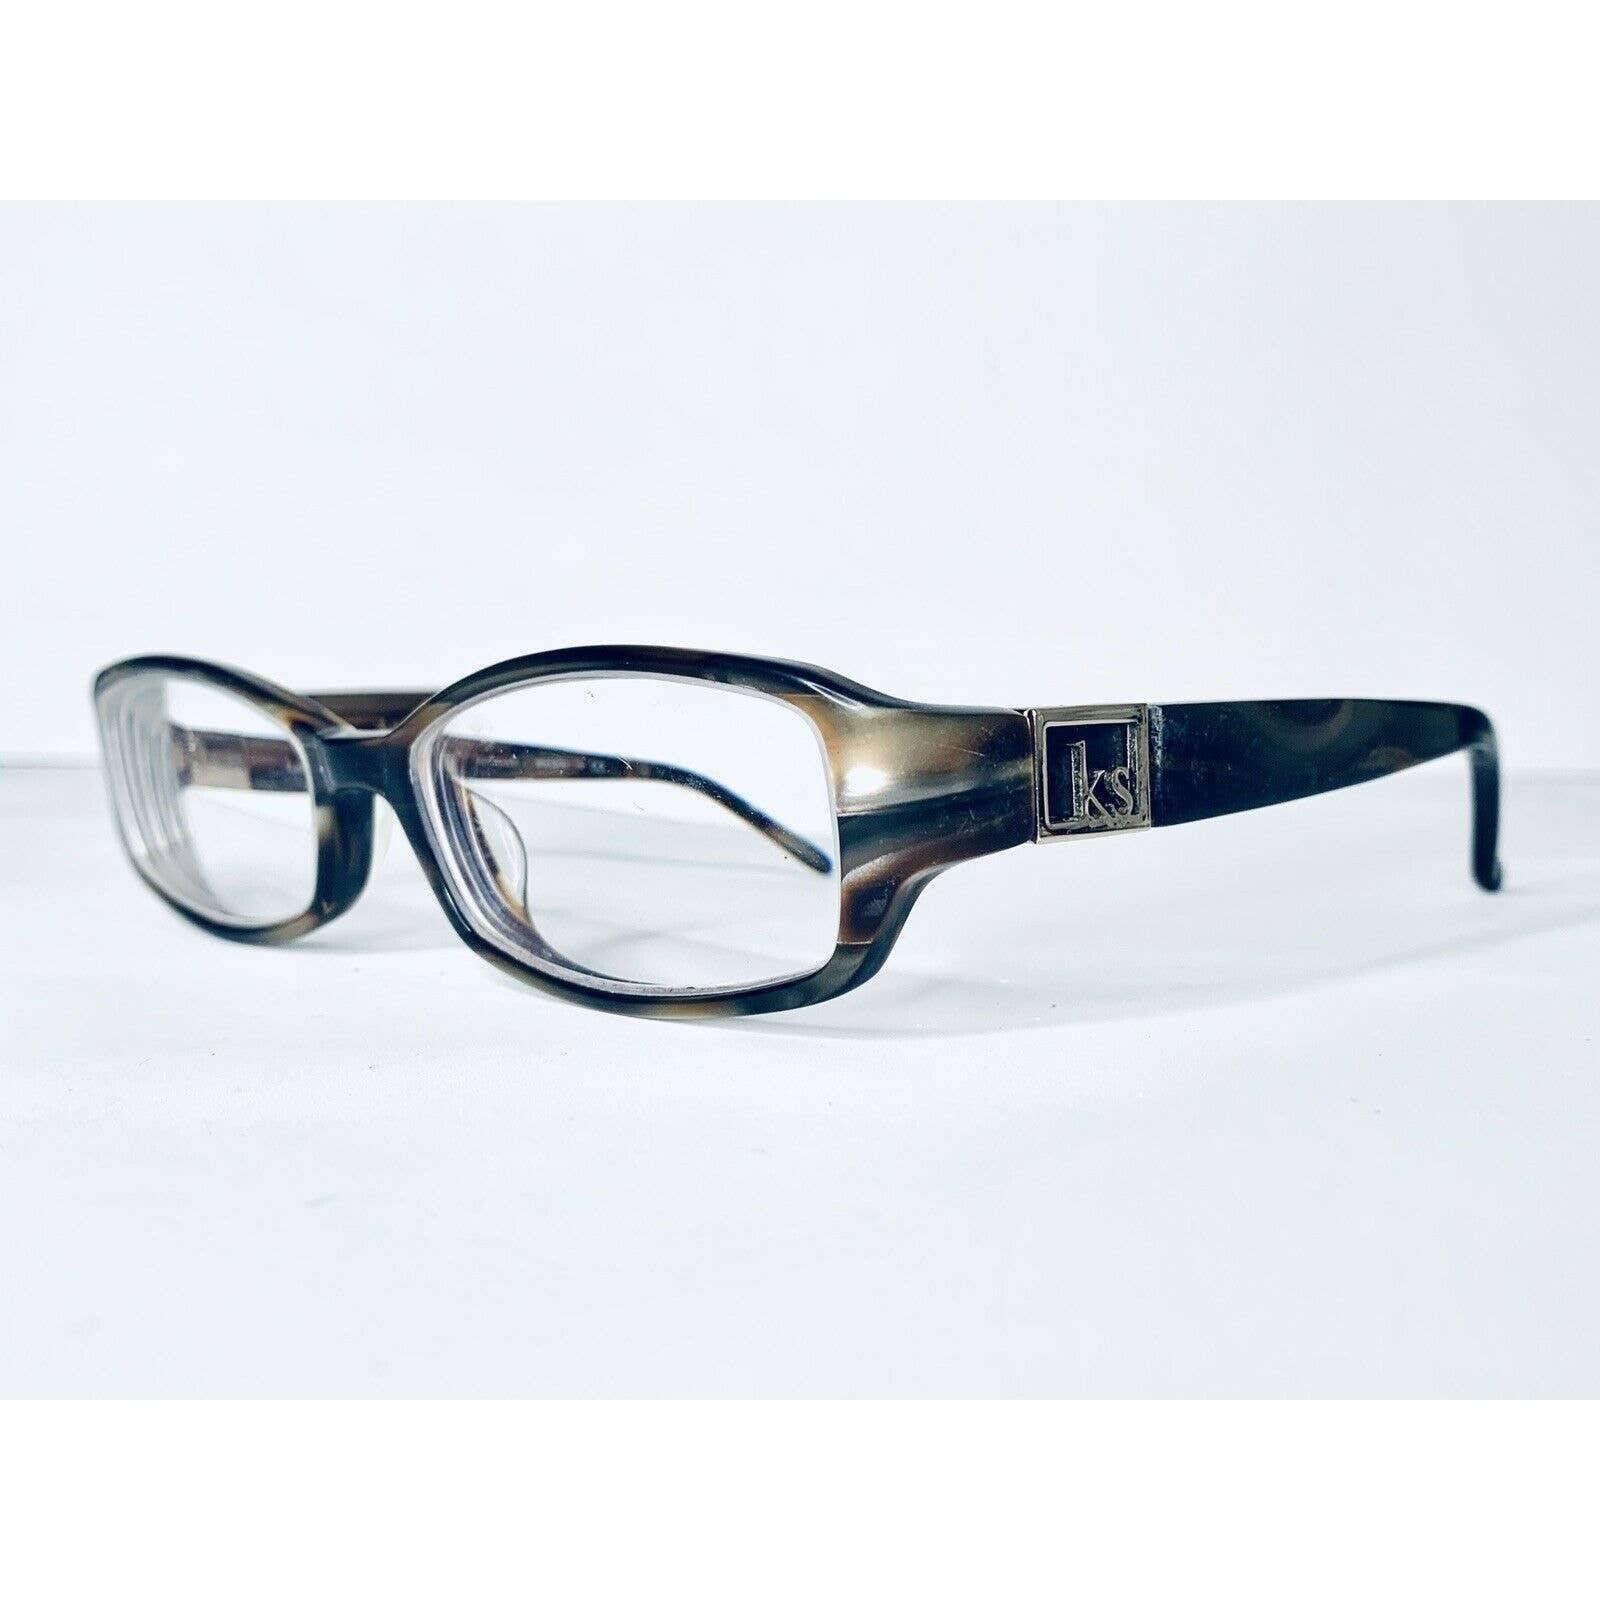 Kate Spade Tortoise Acetate Glasses